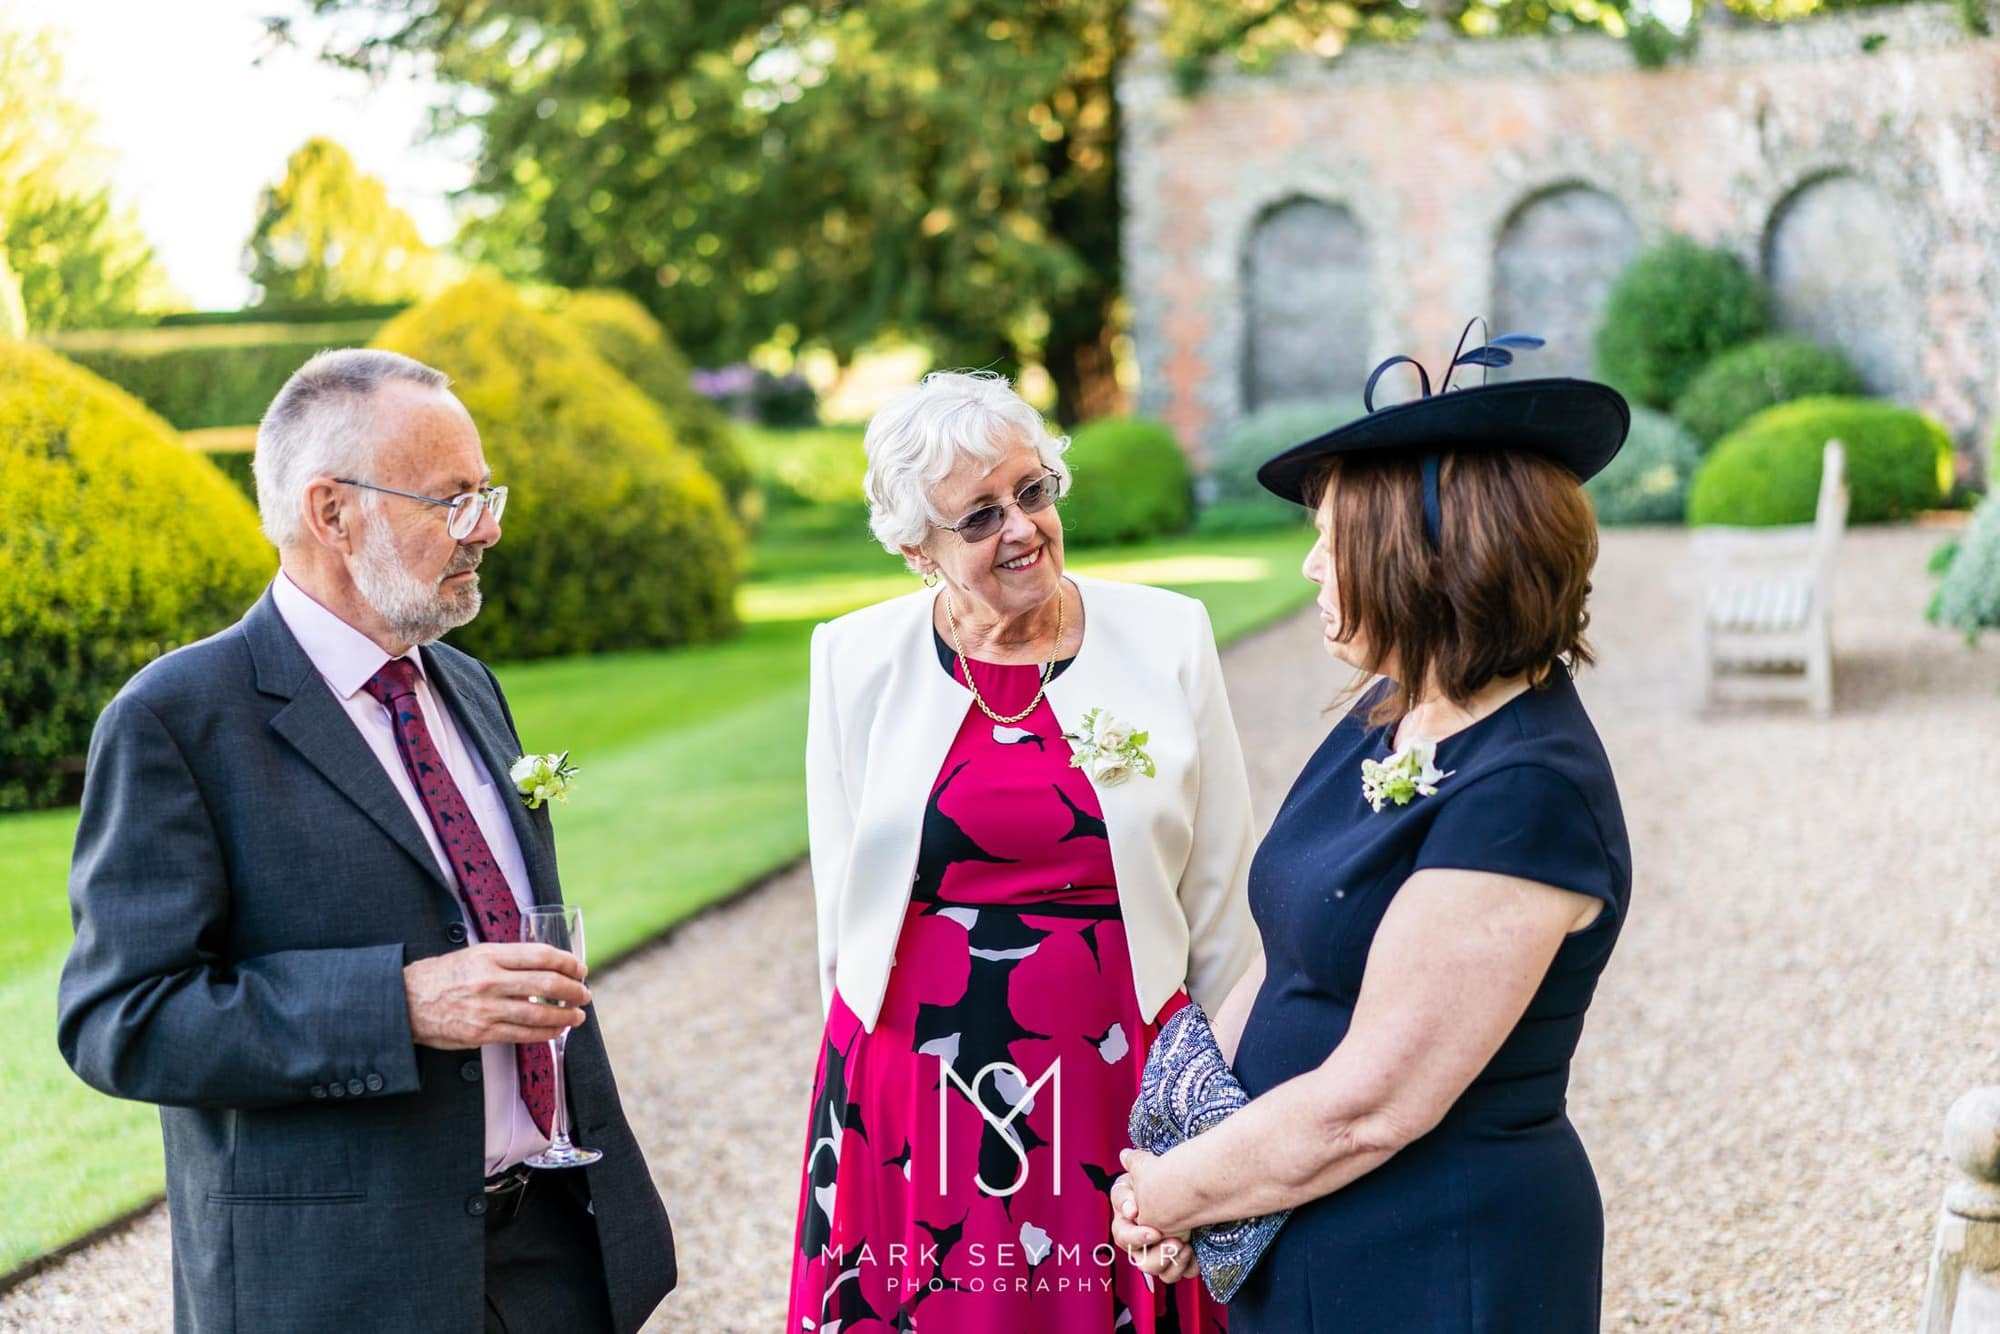 Hampden House Wedding Photography - Hannah and Lee's wedding. 15